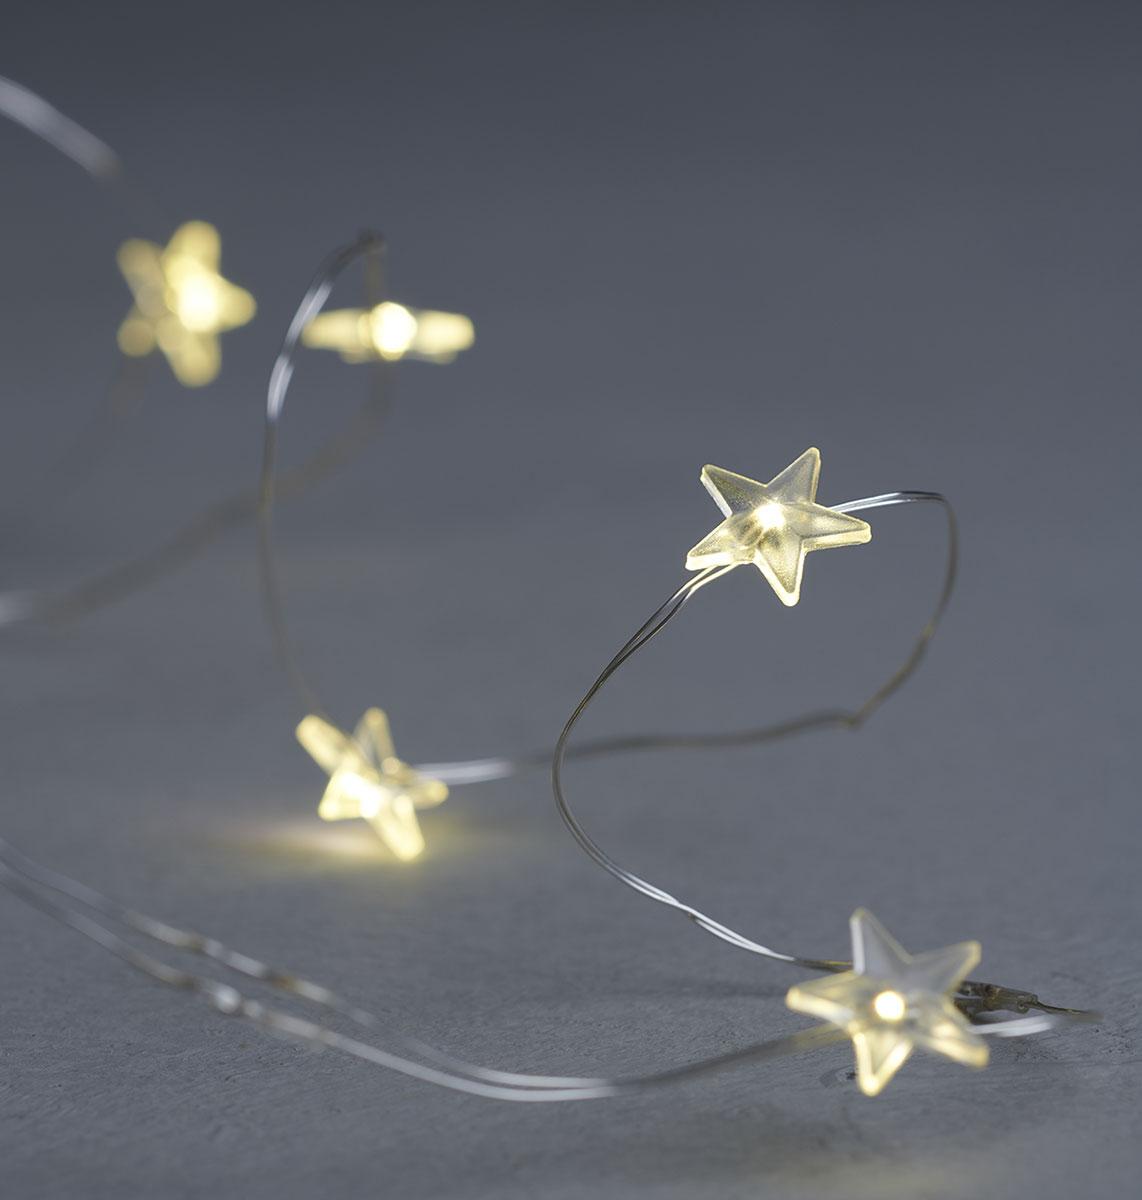 Guirlande lumineuse étoiles indoor Sirius Trille Fil argent 20 leds warm white